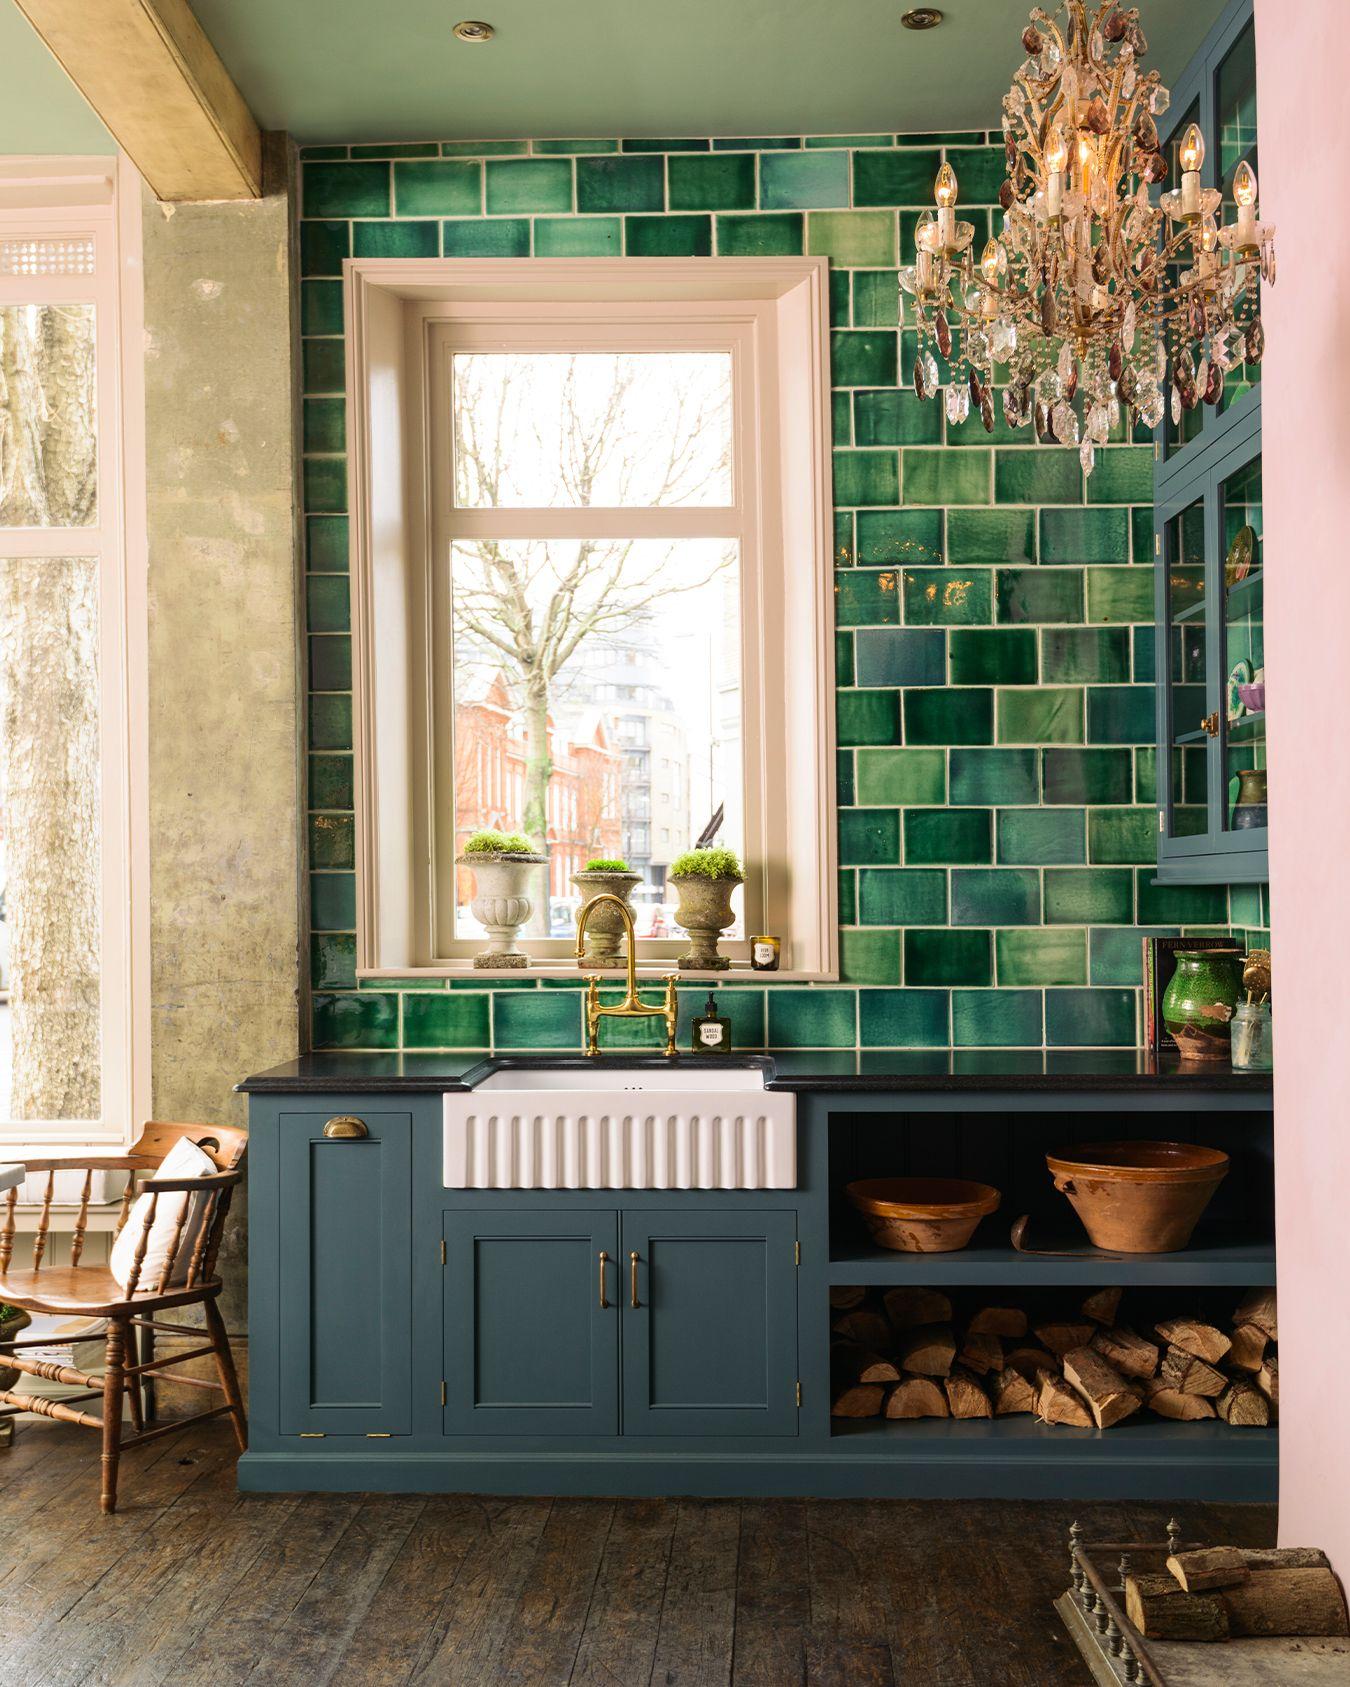 bespoke kitchens by devol classic georgian style english kitchens interior design kitchen on kitchen interior classic id=21289